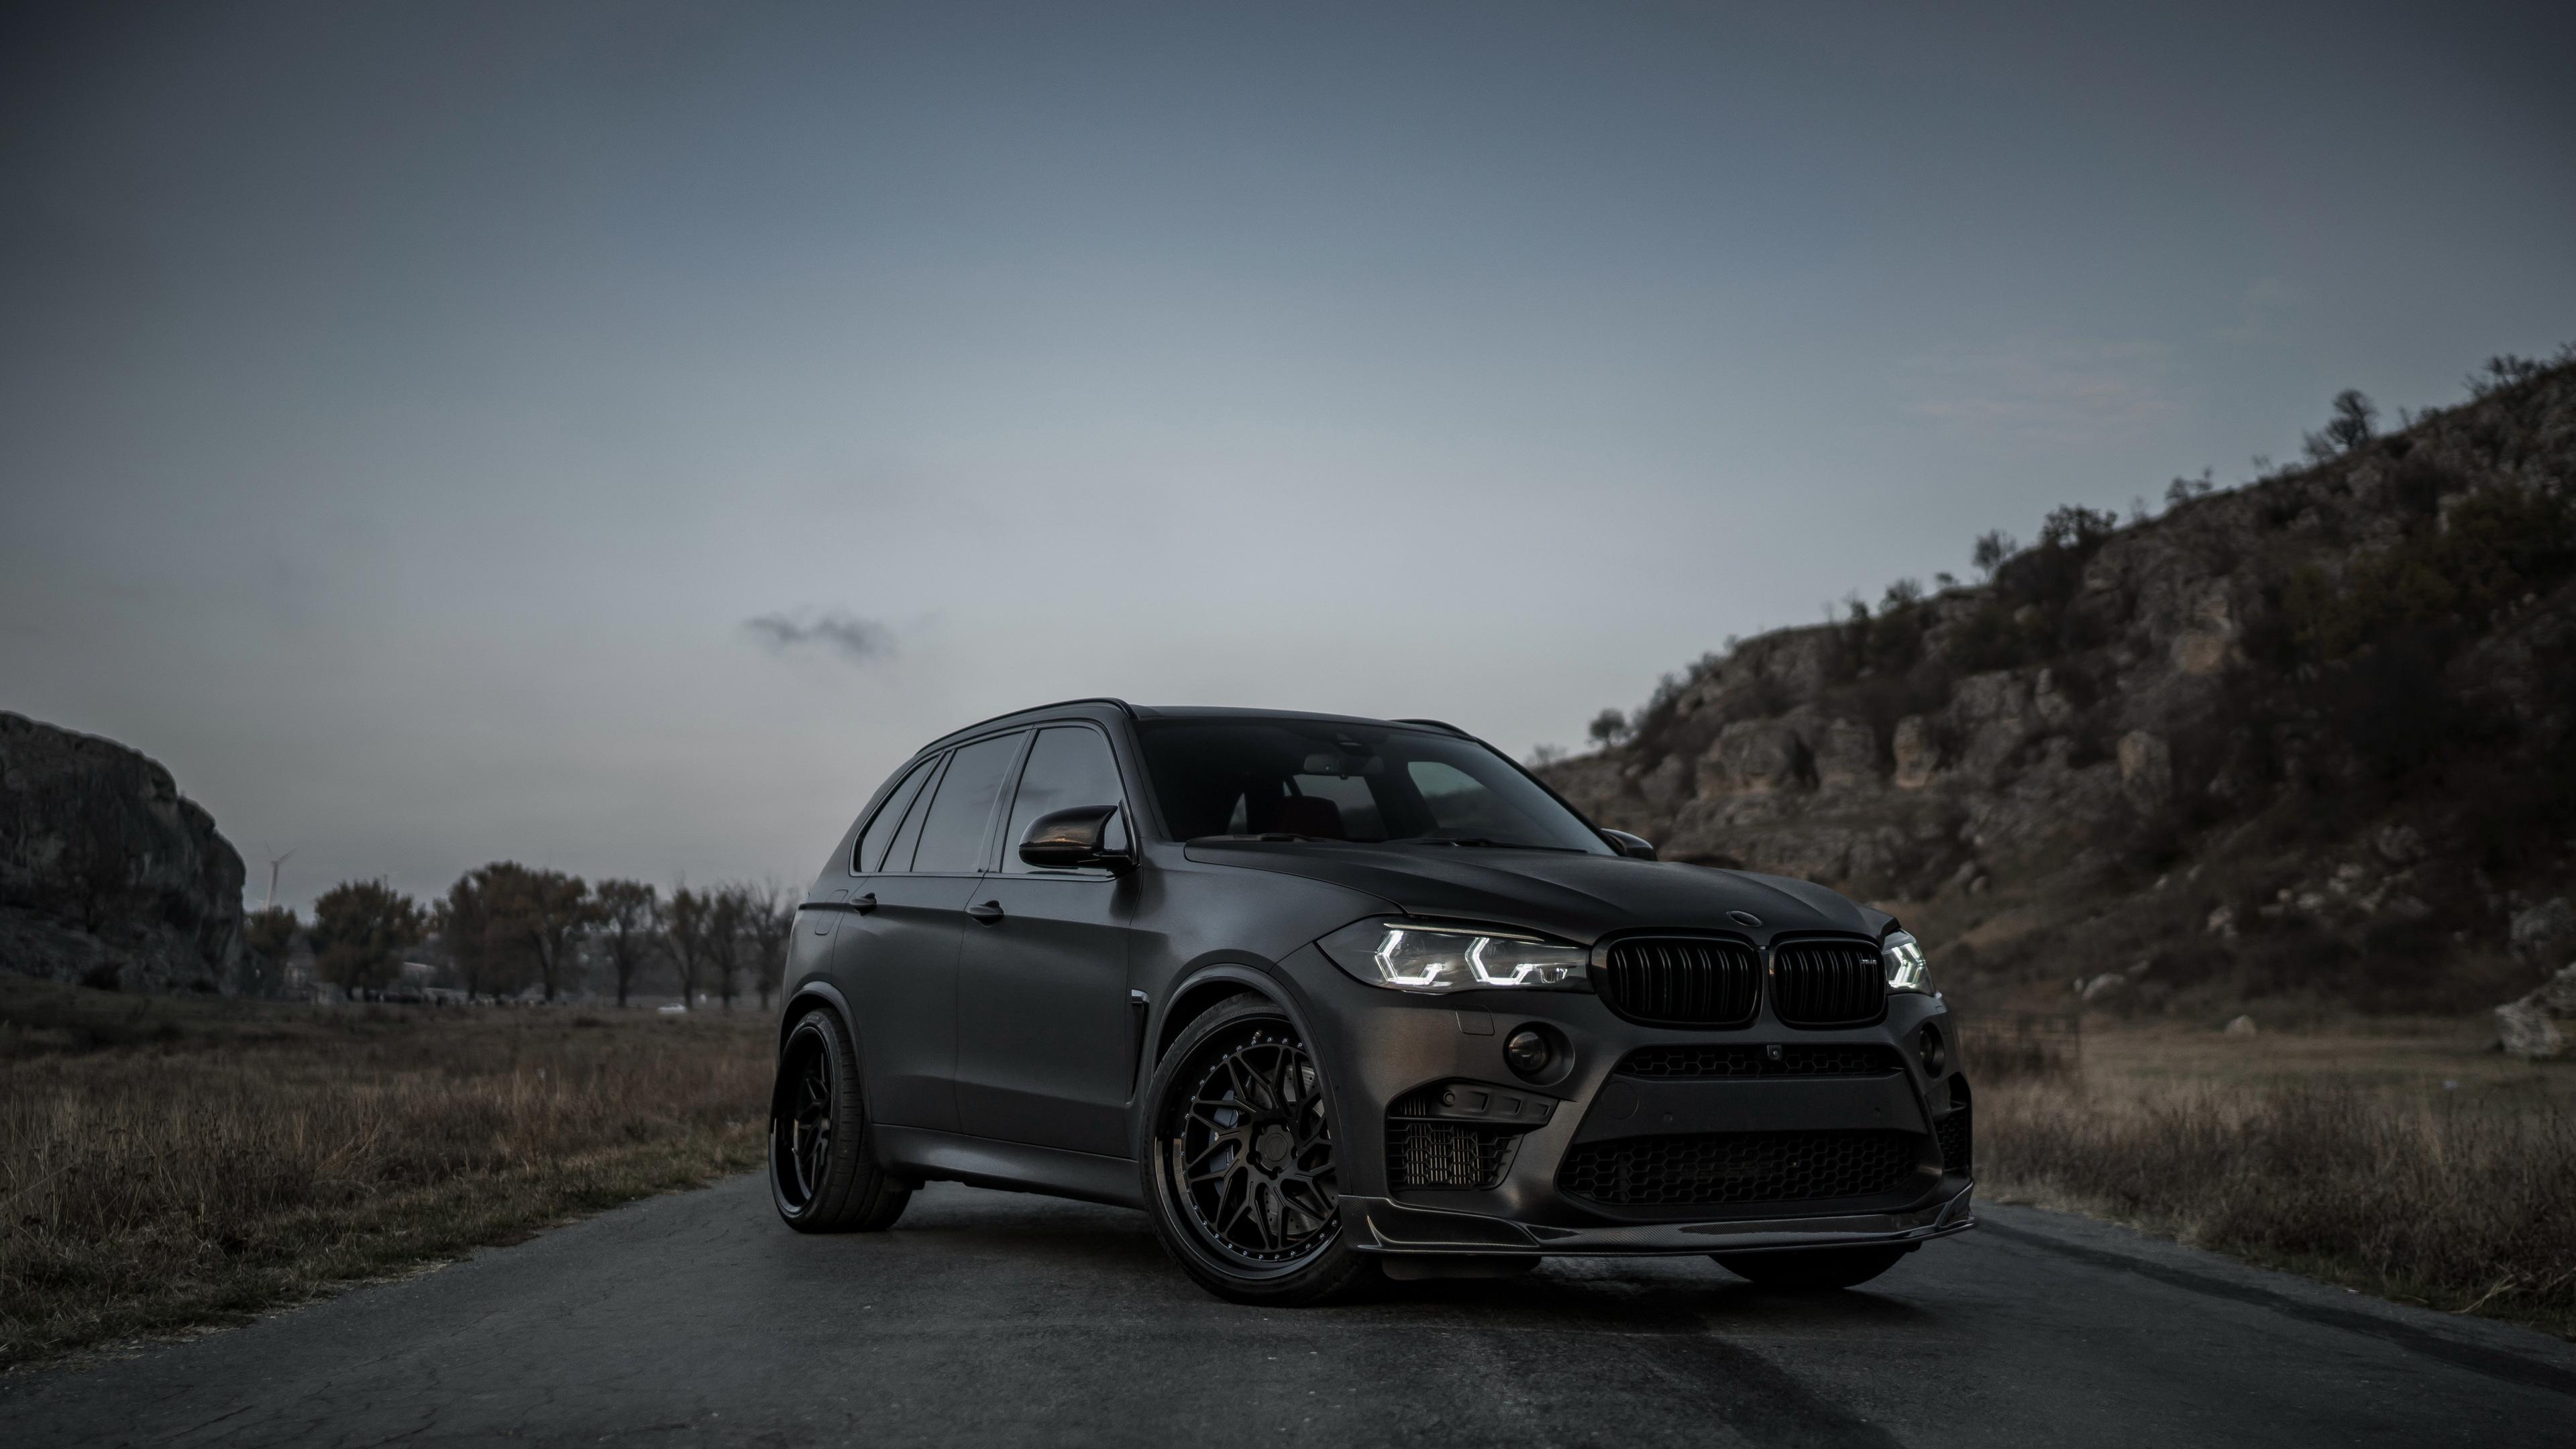 z performance bmw x5 2018 4k 1539109214 - Z Performance BMW X5 2018 4k - hd-wallpapers, cars wallpapers, bmw x5 wallpapers, bmw wallpapers, 4k-wallpapers, 2018 cars wallpapers